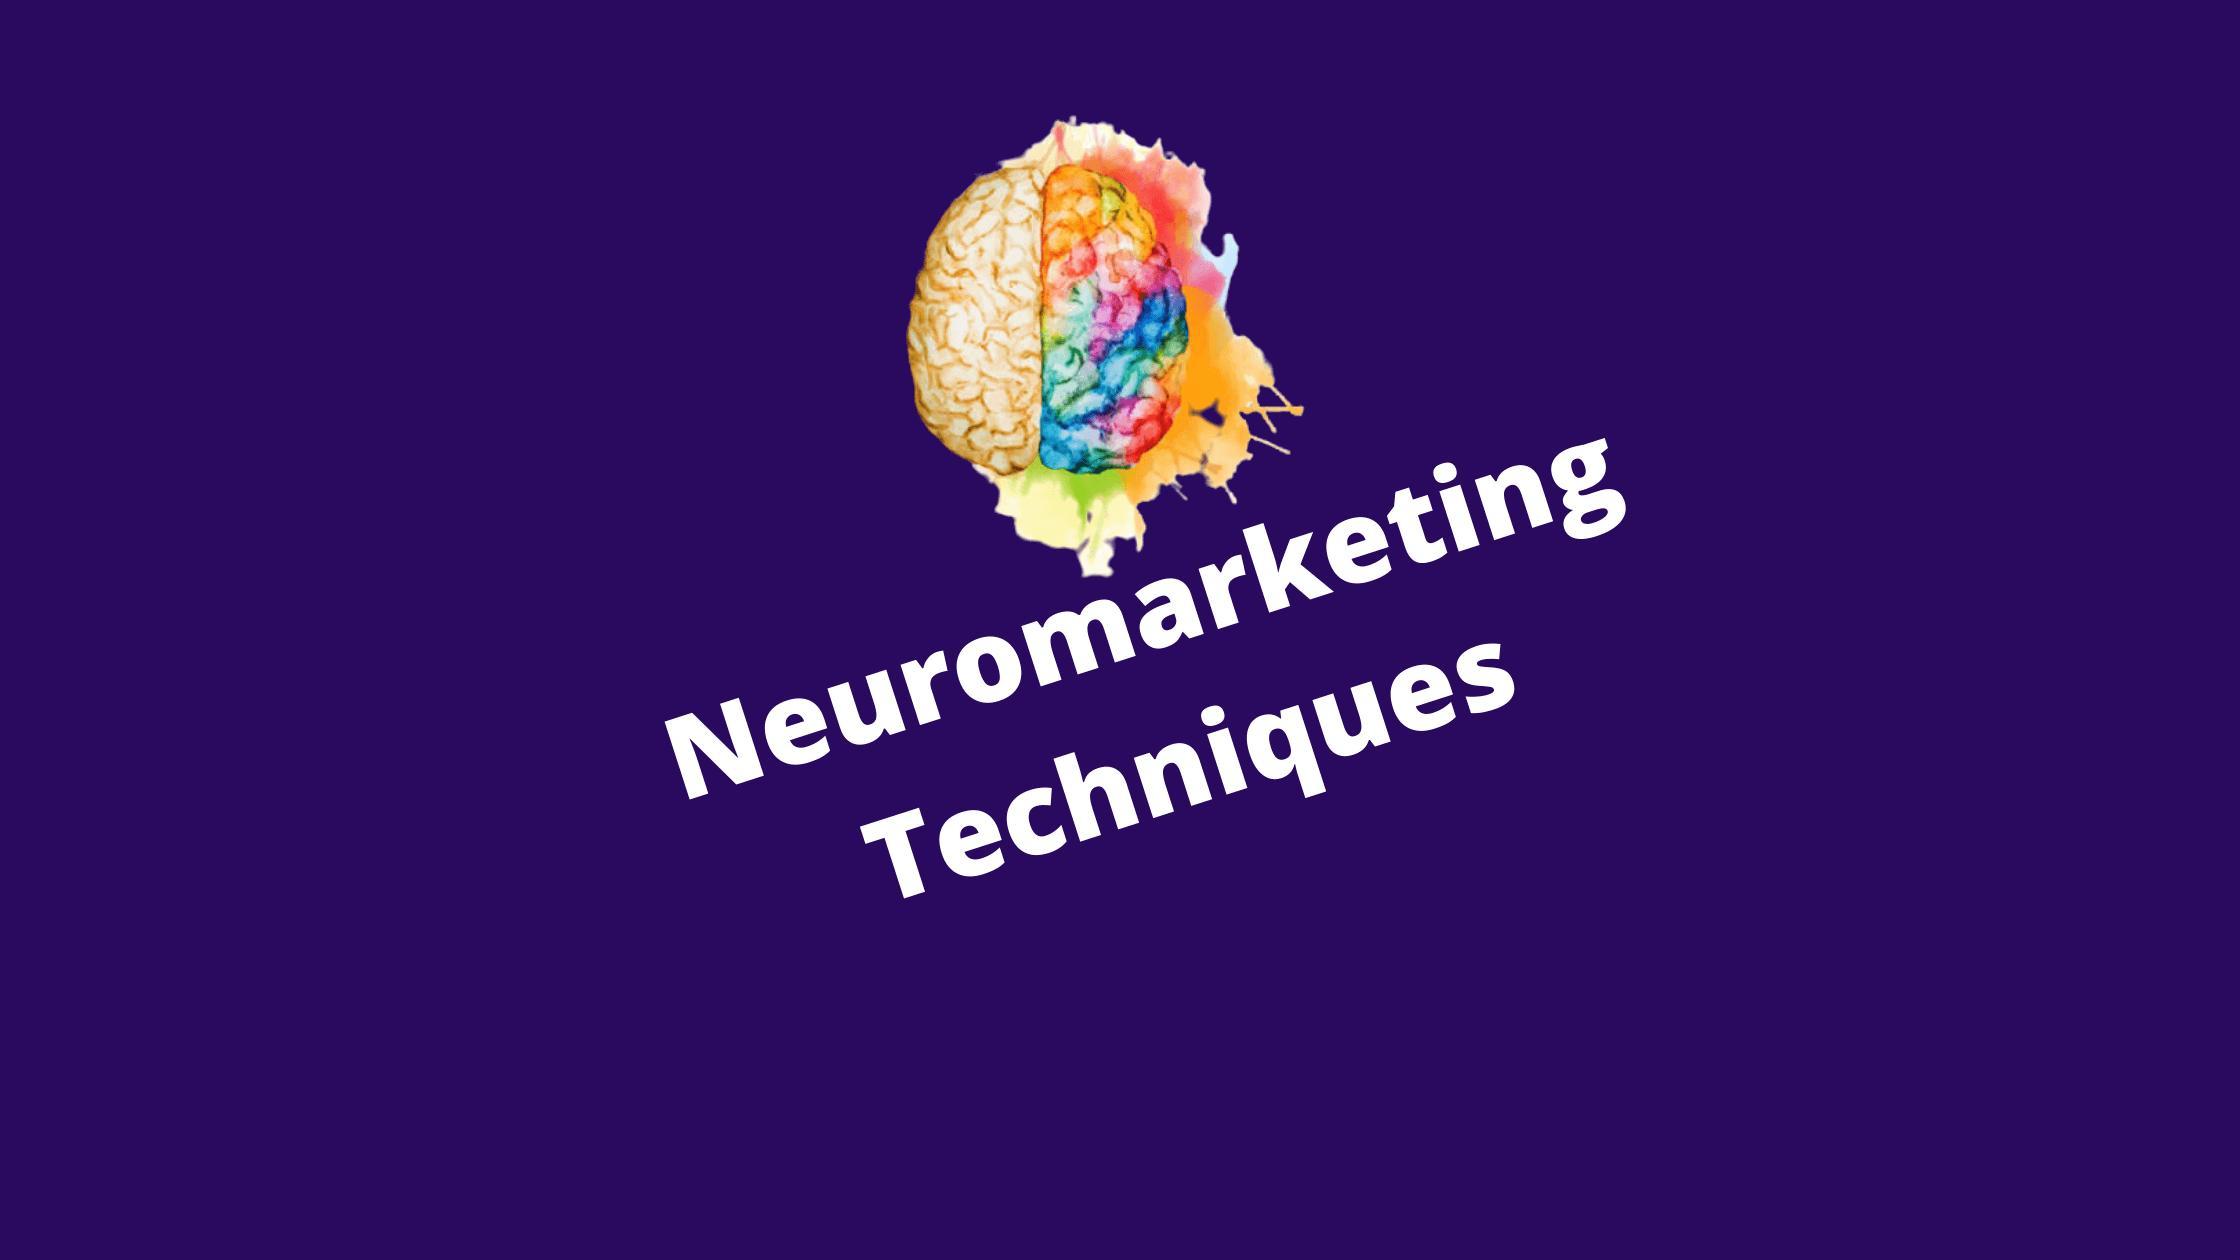 neuromarketing techniques